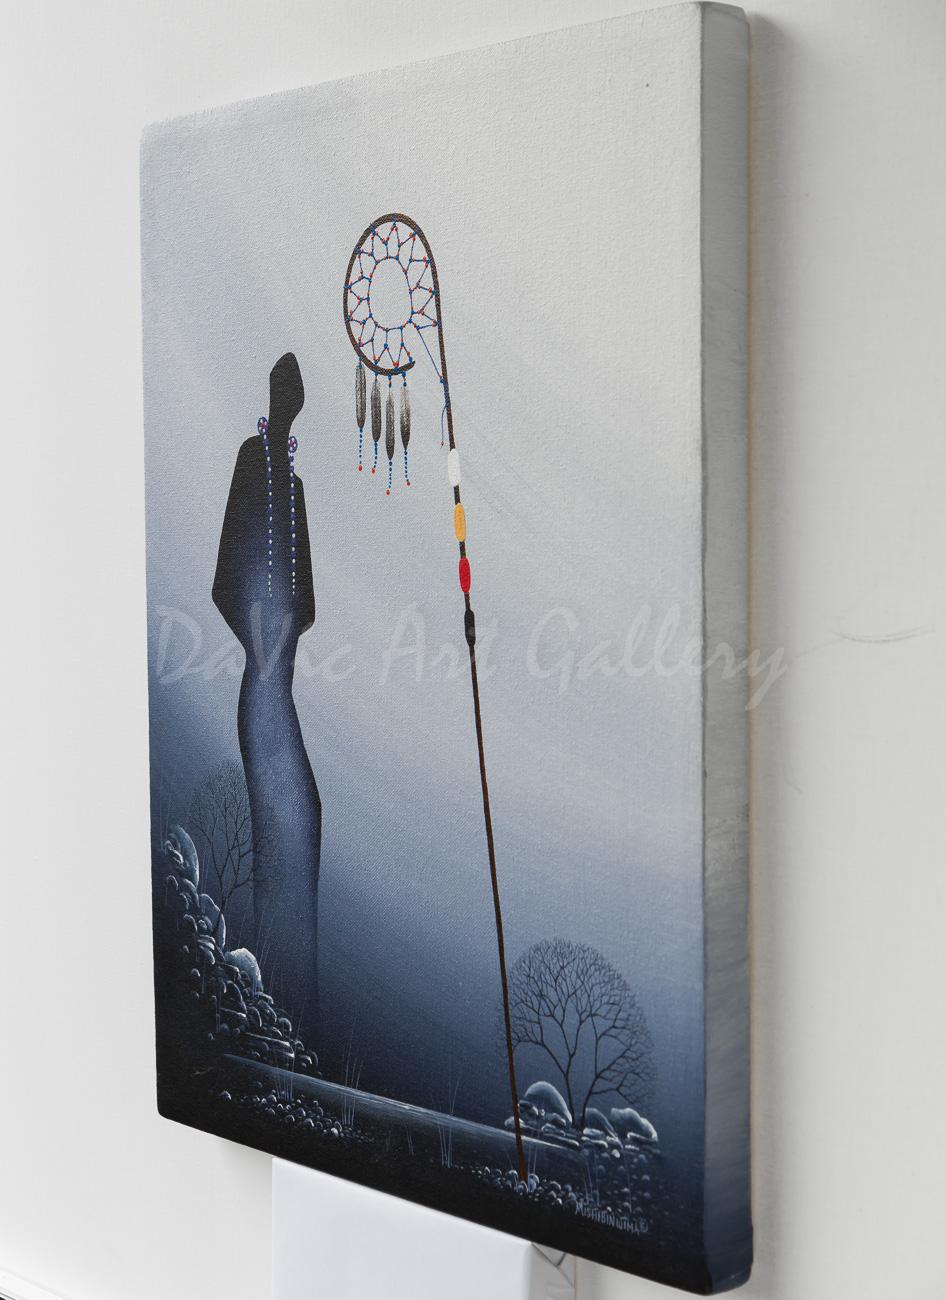 'Respect' by James Simon Mishibinijima - Woodland Art - Seven Grandfathers